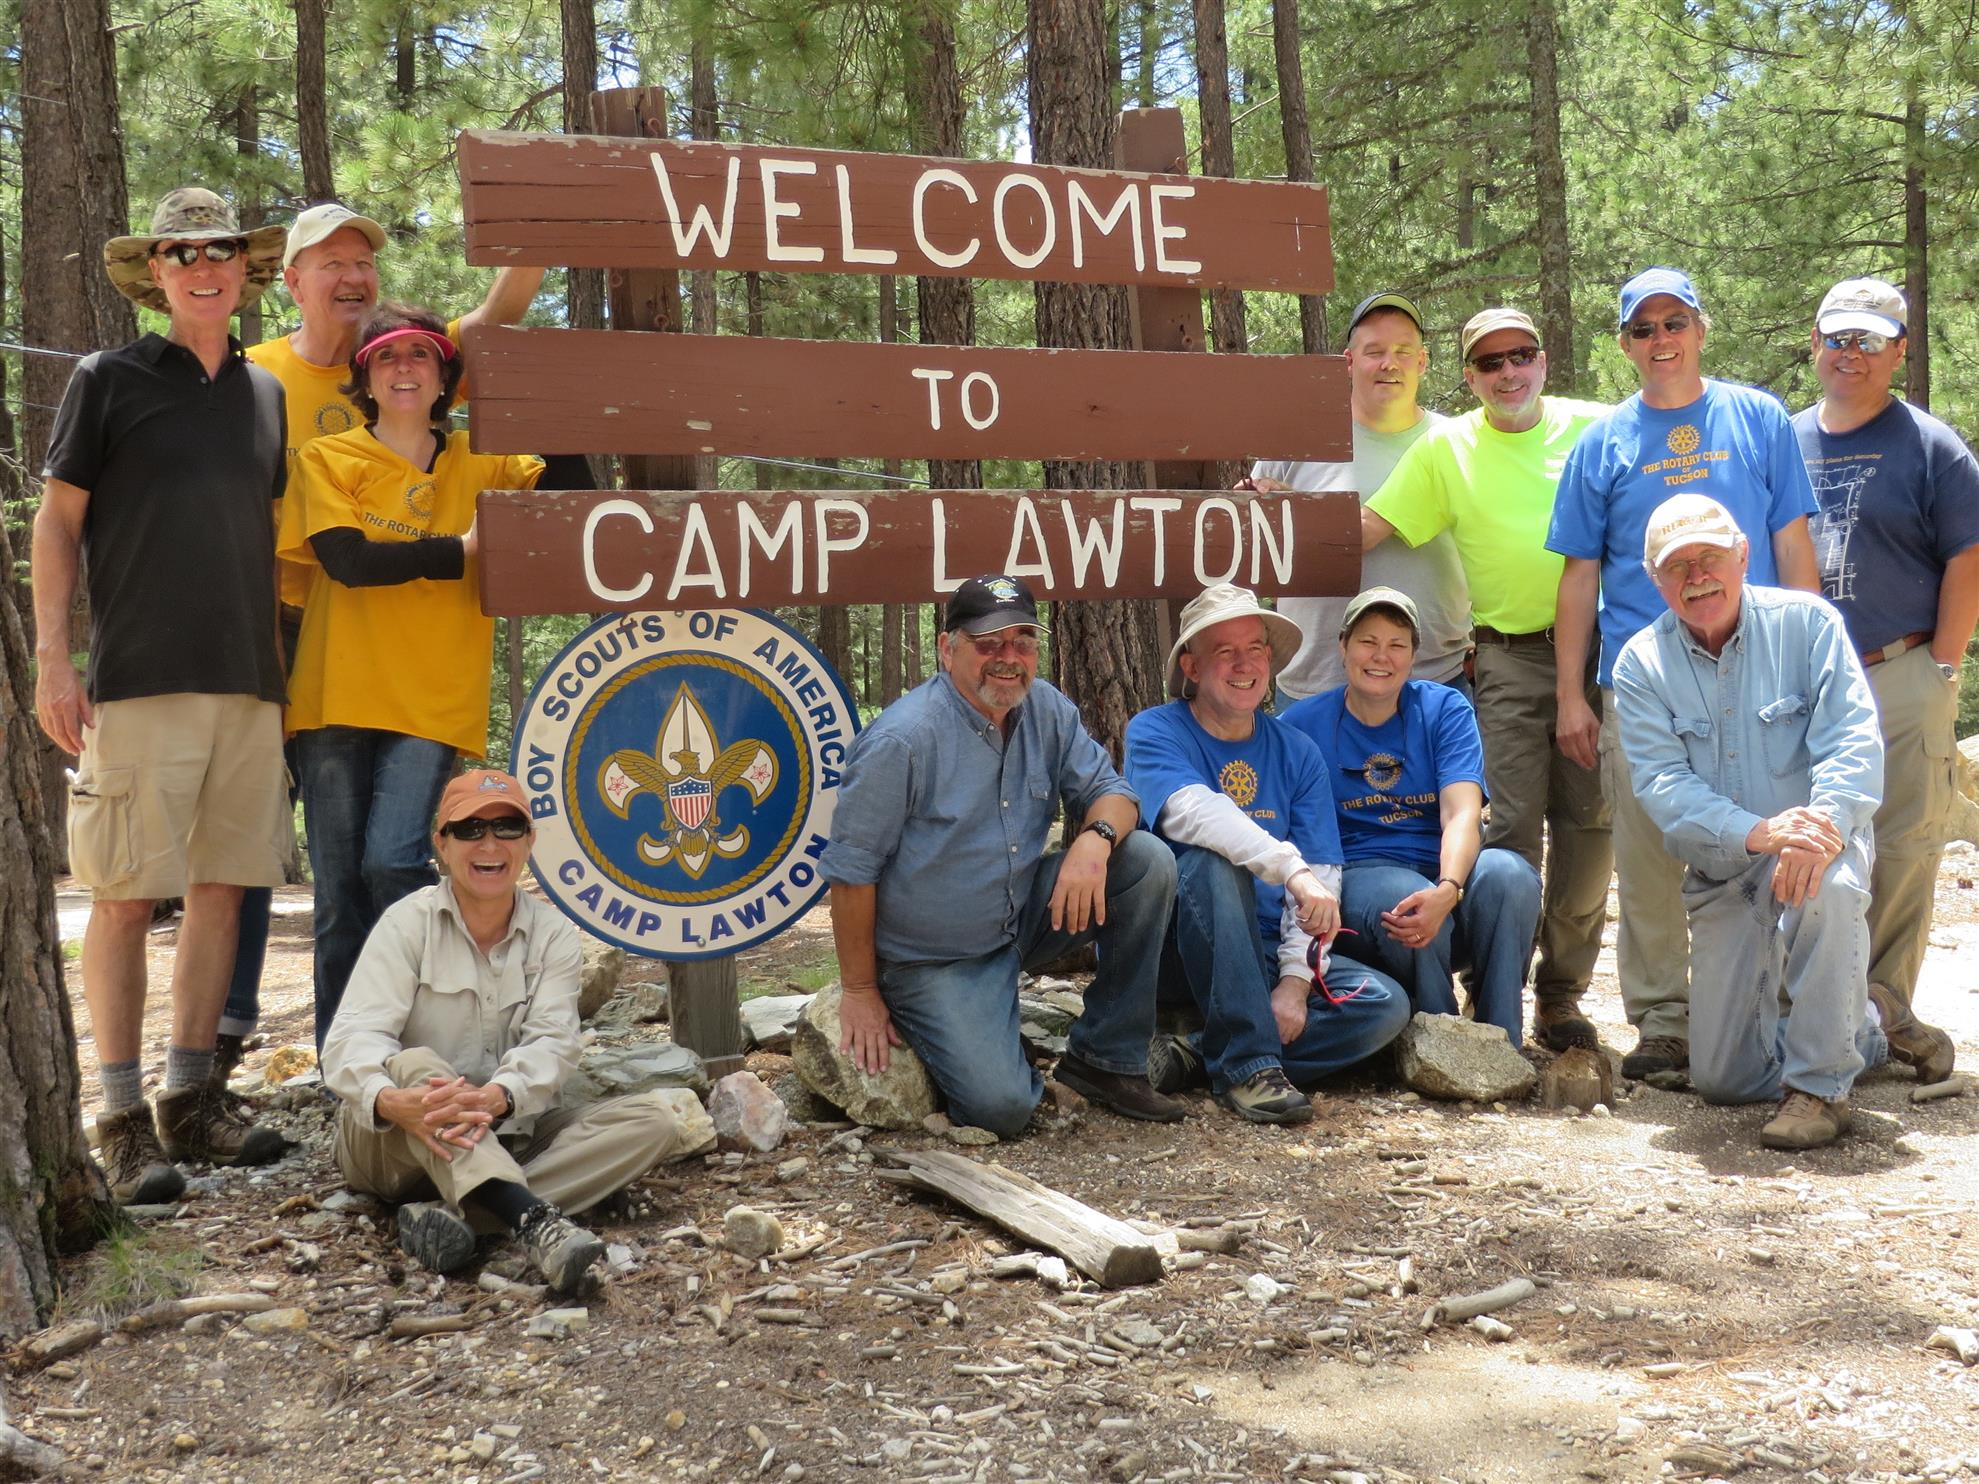 Boy Scout Camp Lawton Rotary Club Of Tucson